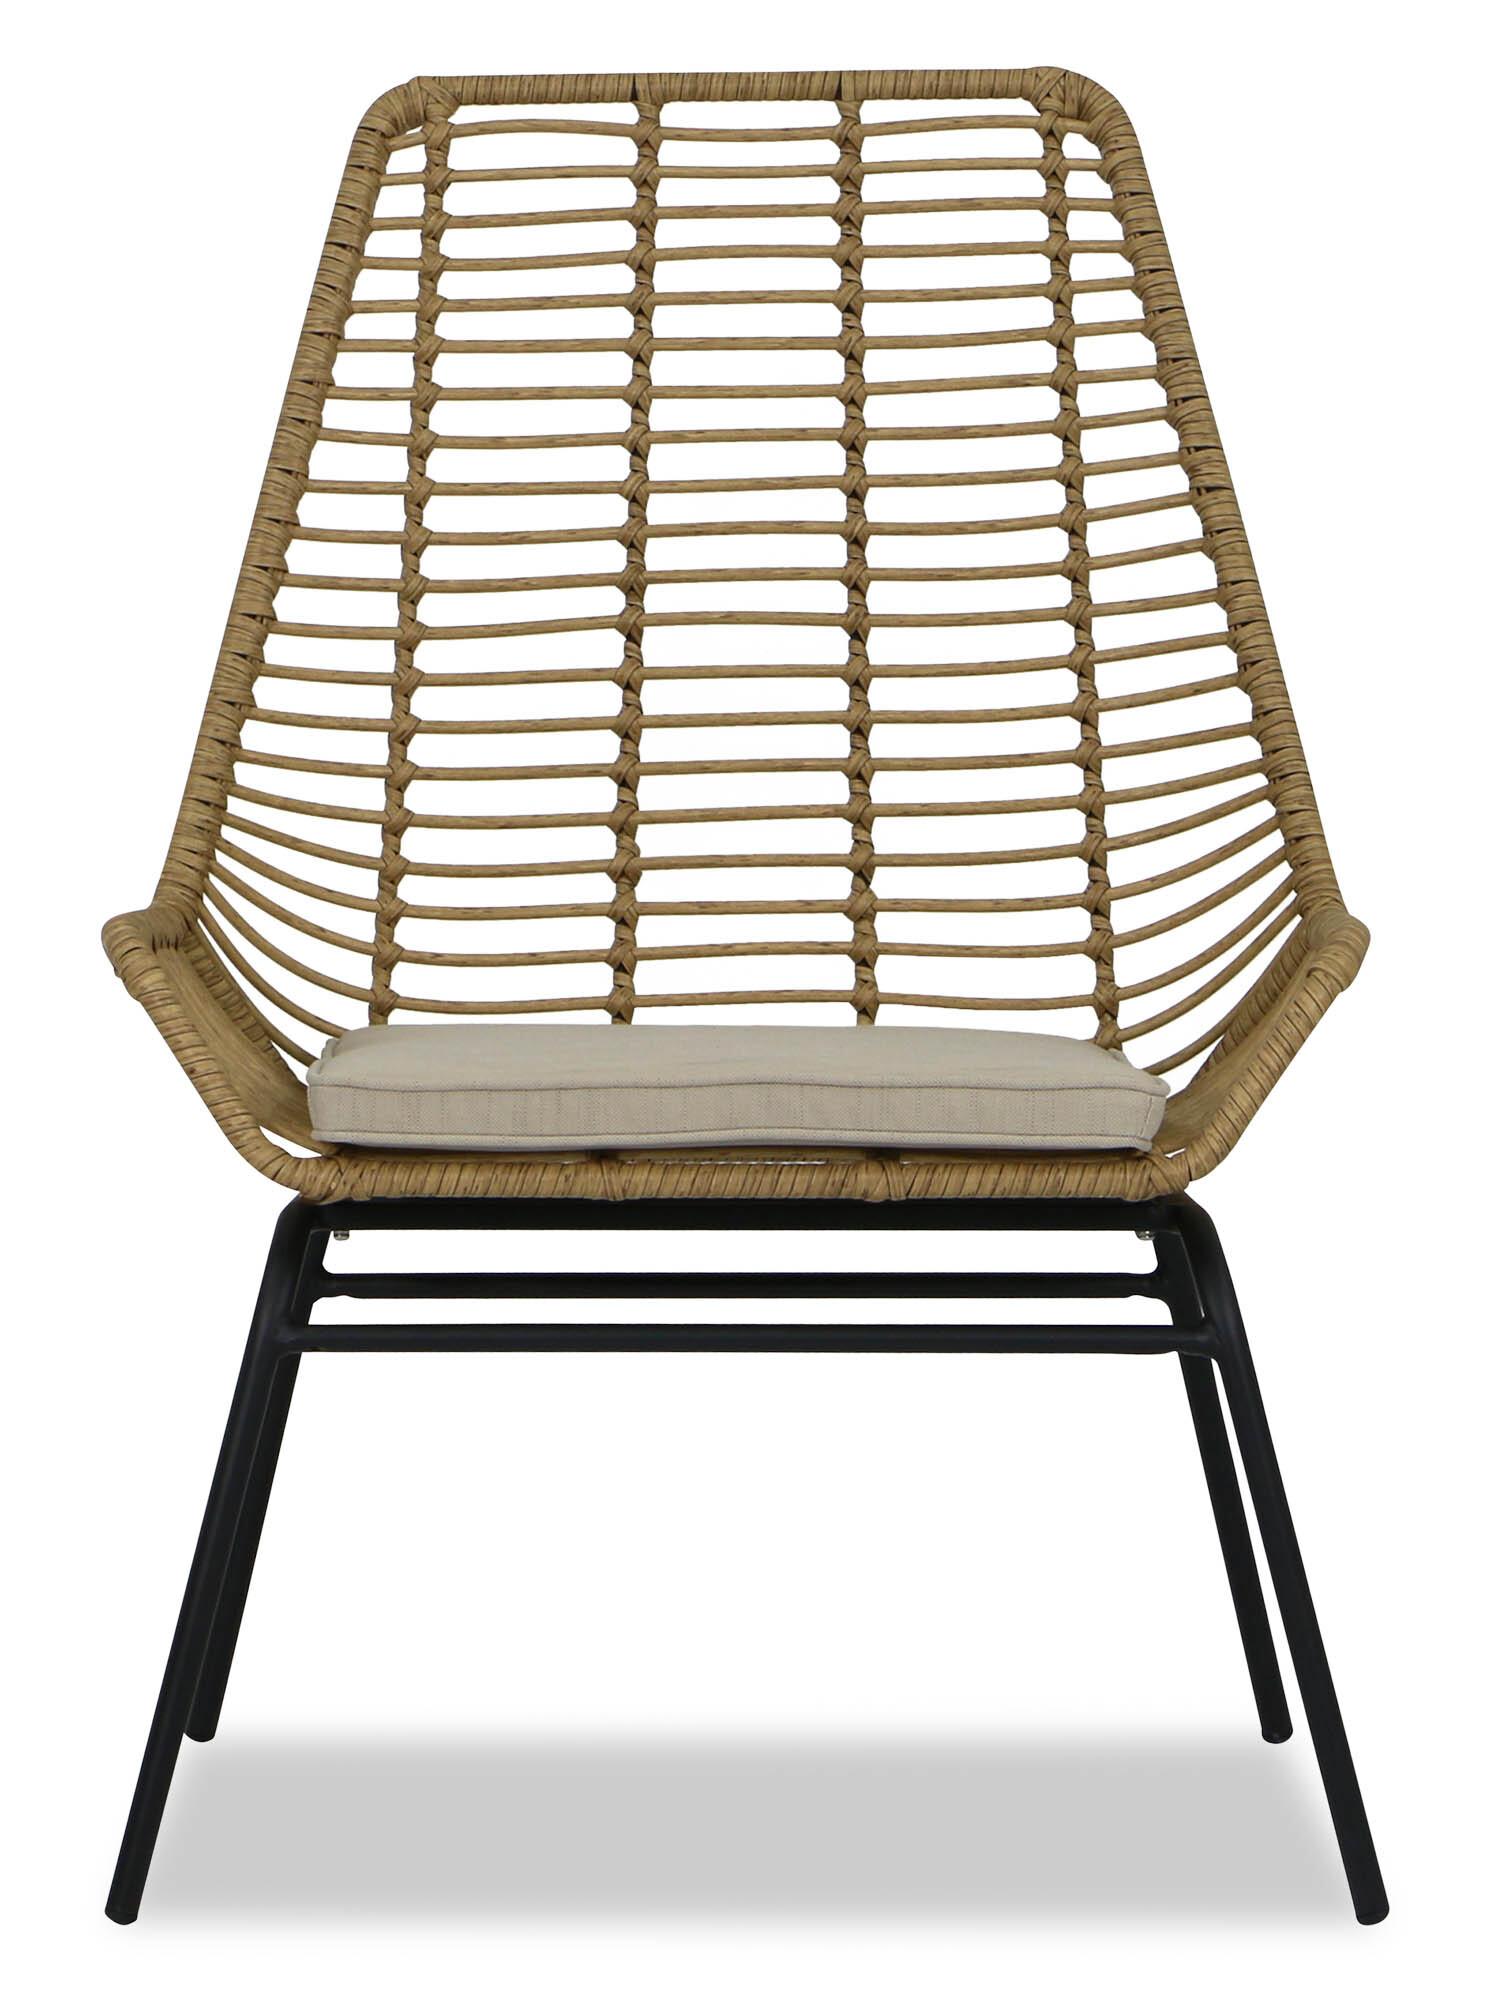 Marigold Wicker Chair Furniture & Home Décor